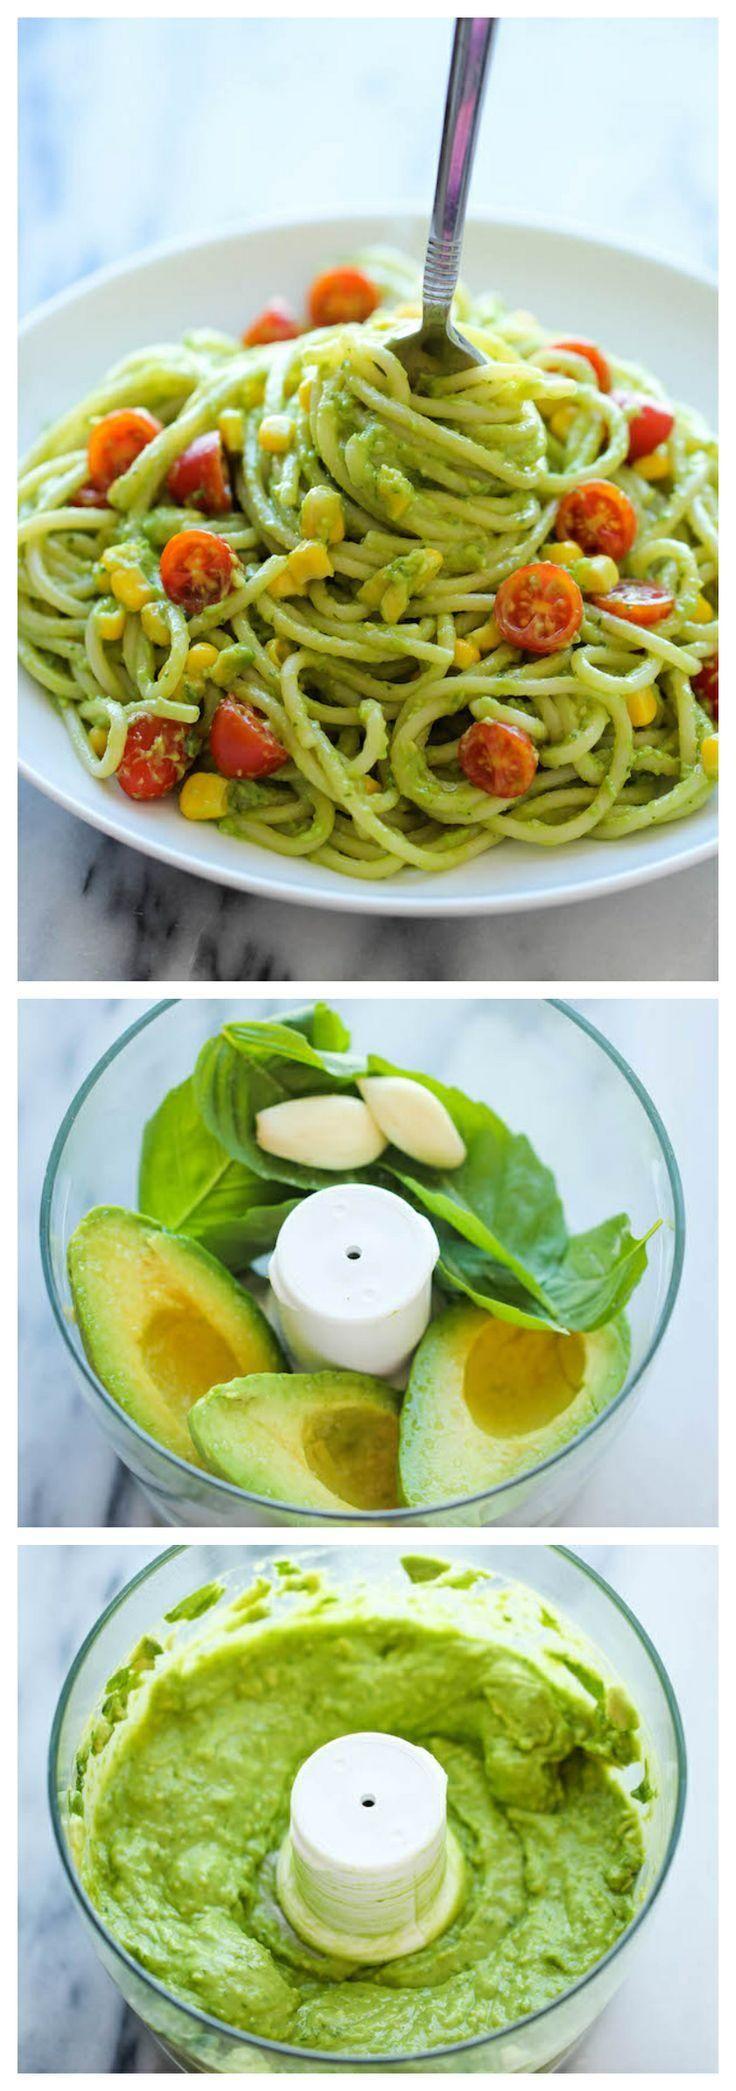 Avocado Pasta